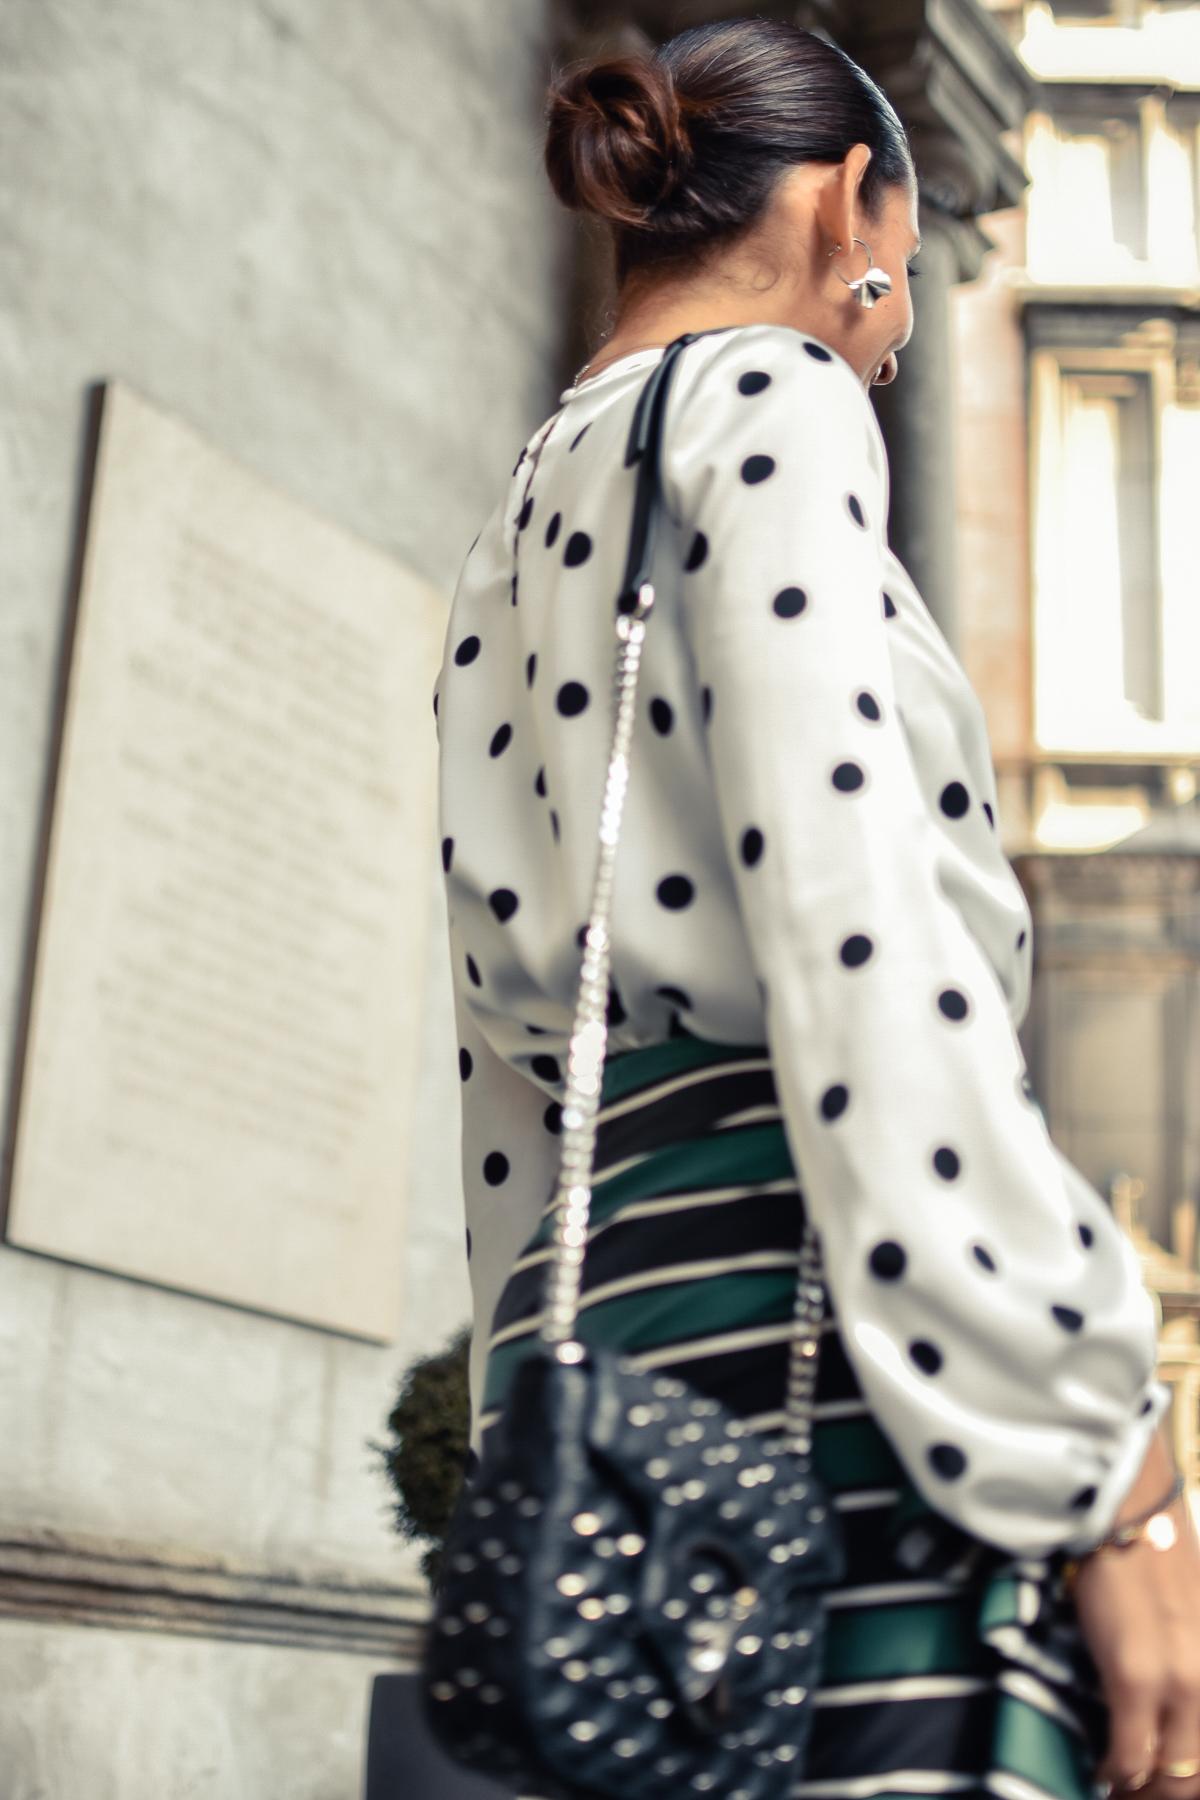 el-blog-de-silvia-mfw-milan-fashion-week-street-style-falda-rayas-manolo-blahnik-11